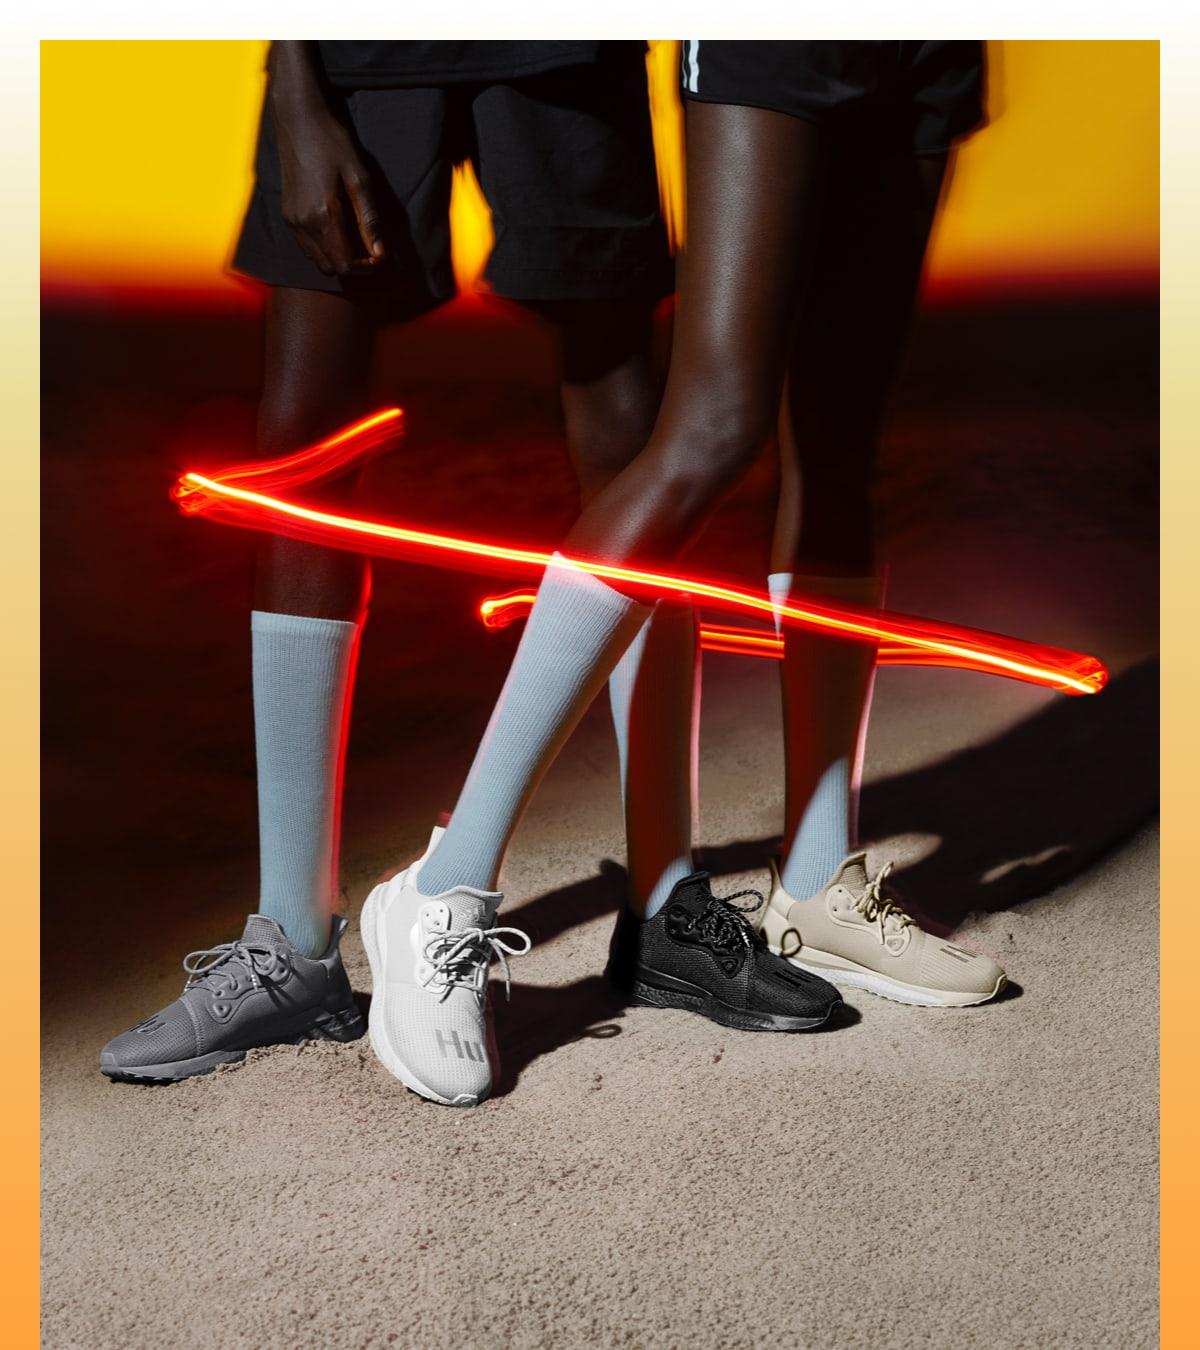 Adidas By Adidas Pharrell Pharrell By WilliamsDe Adidas By Adidas Pharrell WilliamsDe WilliamsDe MSUVzp